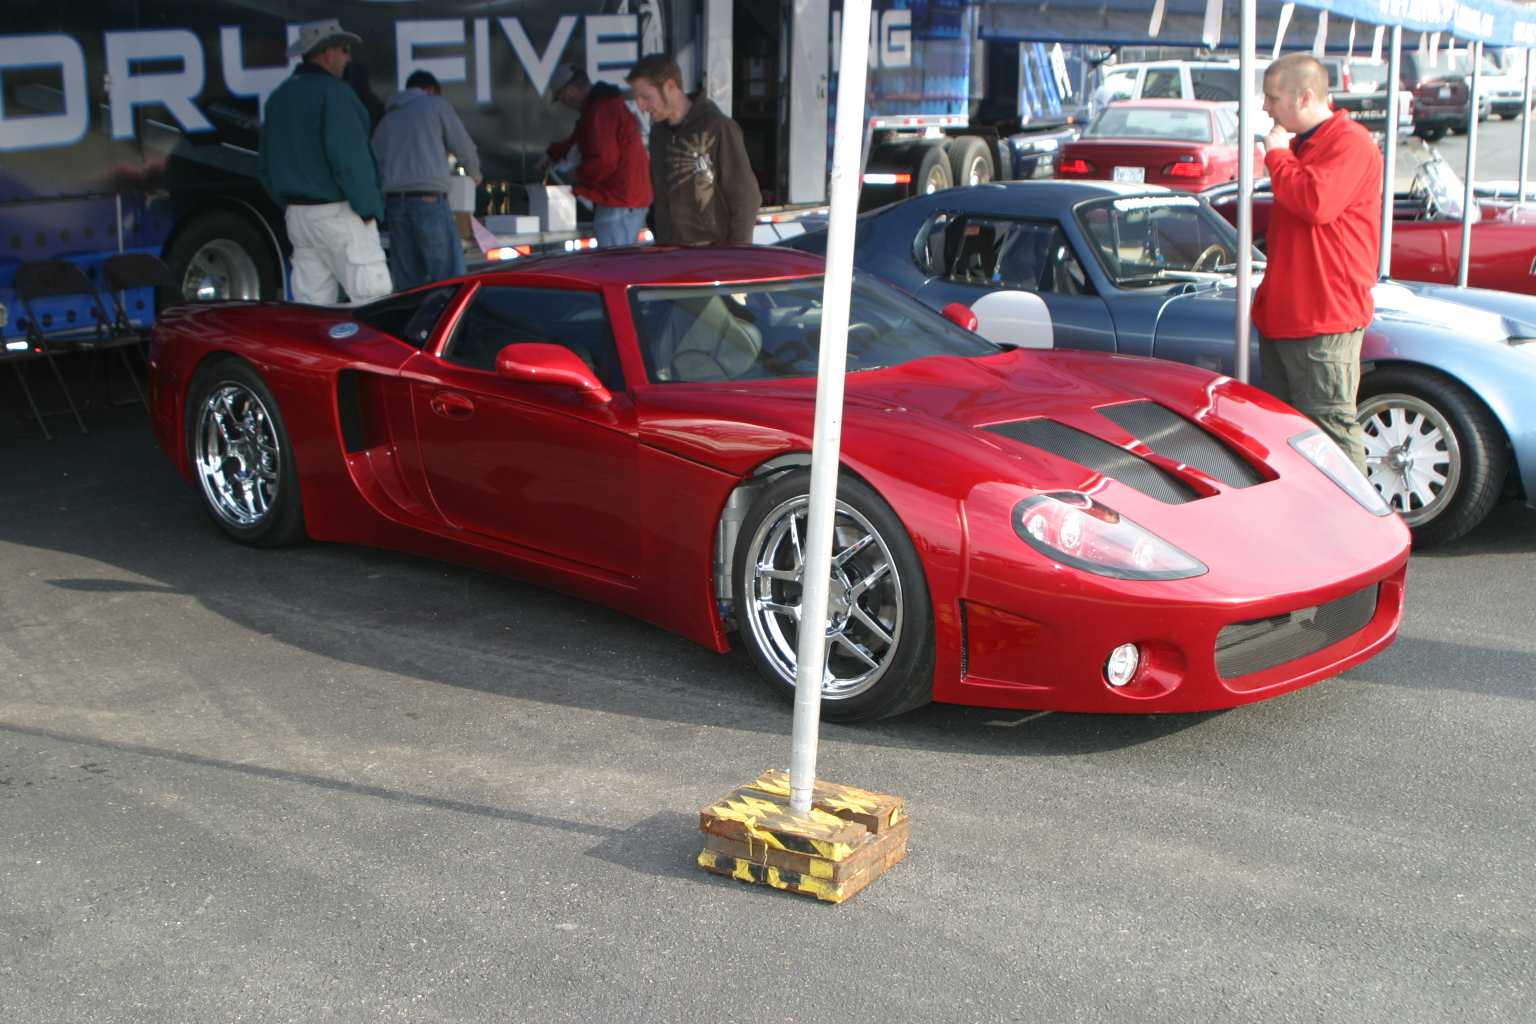 Slc kit car for sale ebay 16